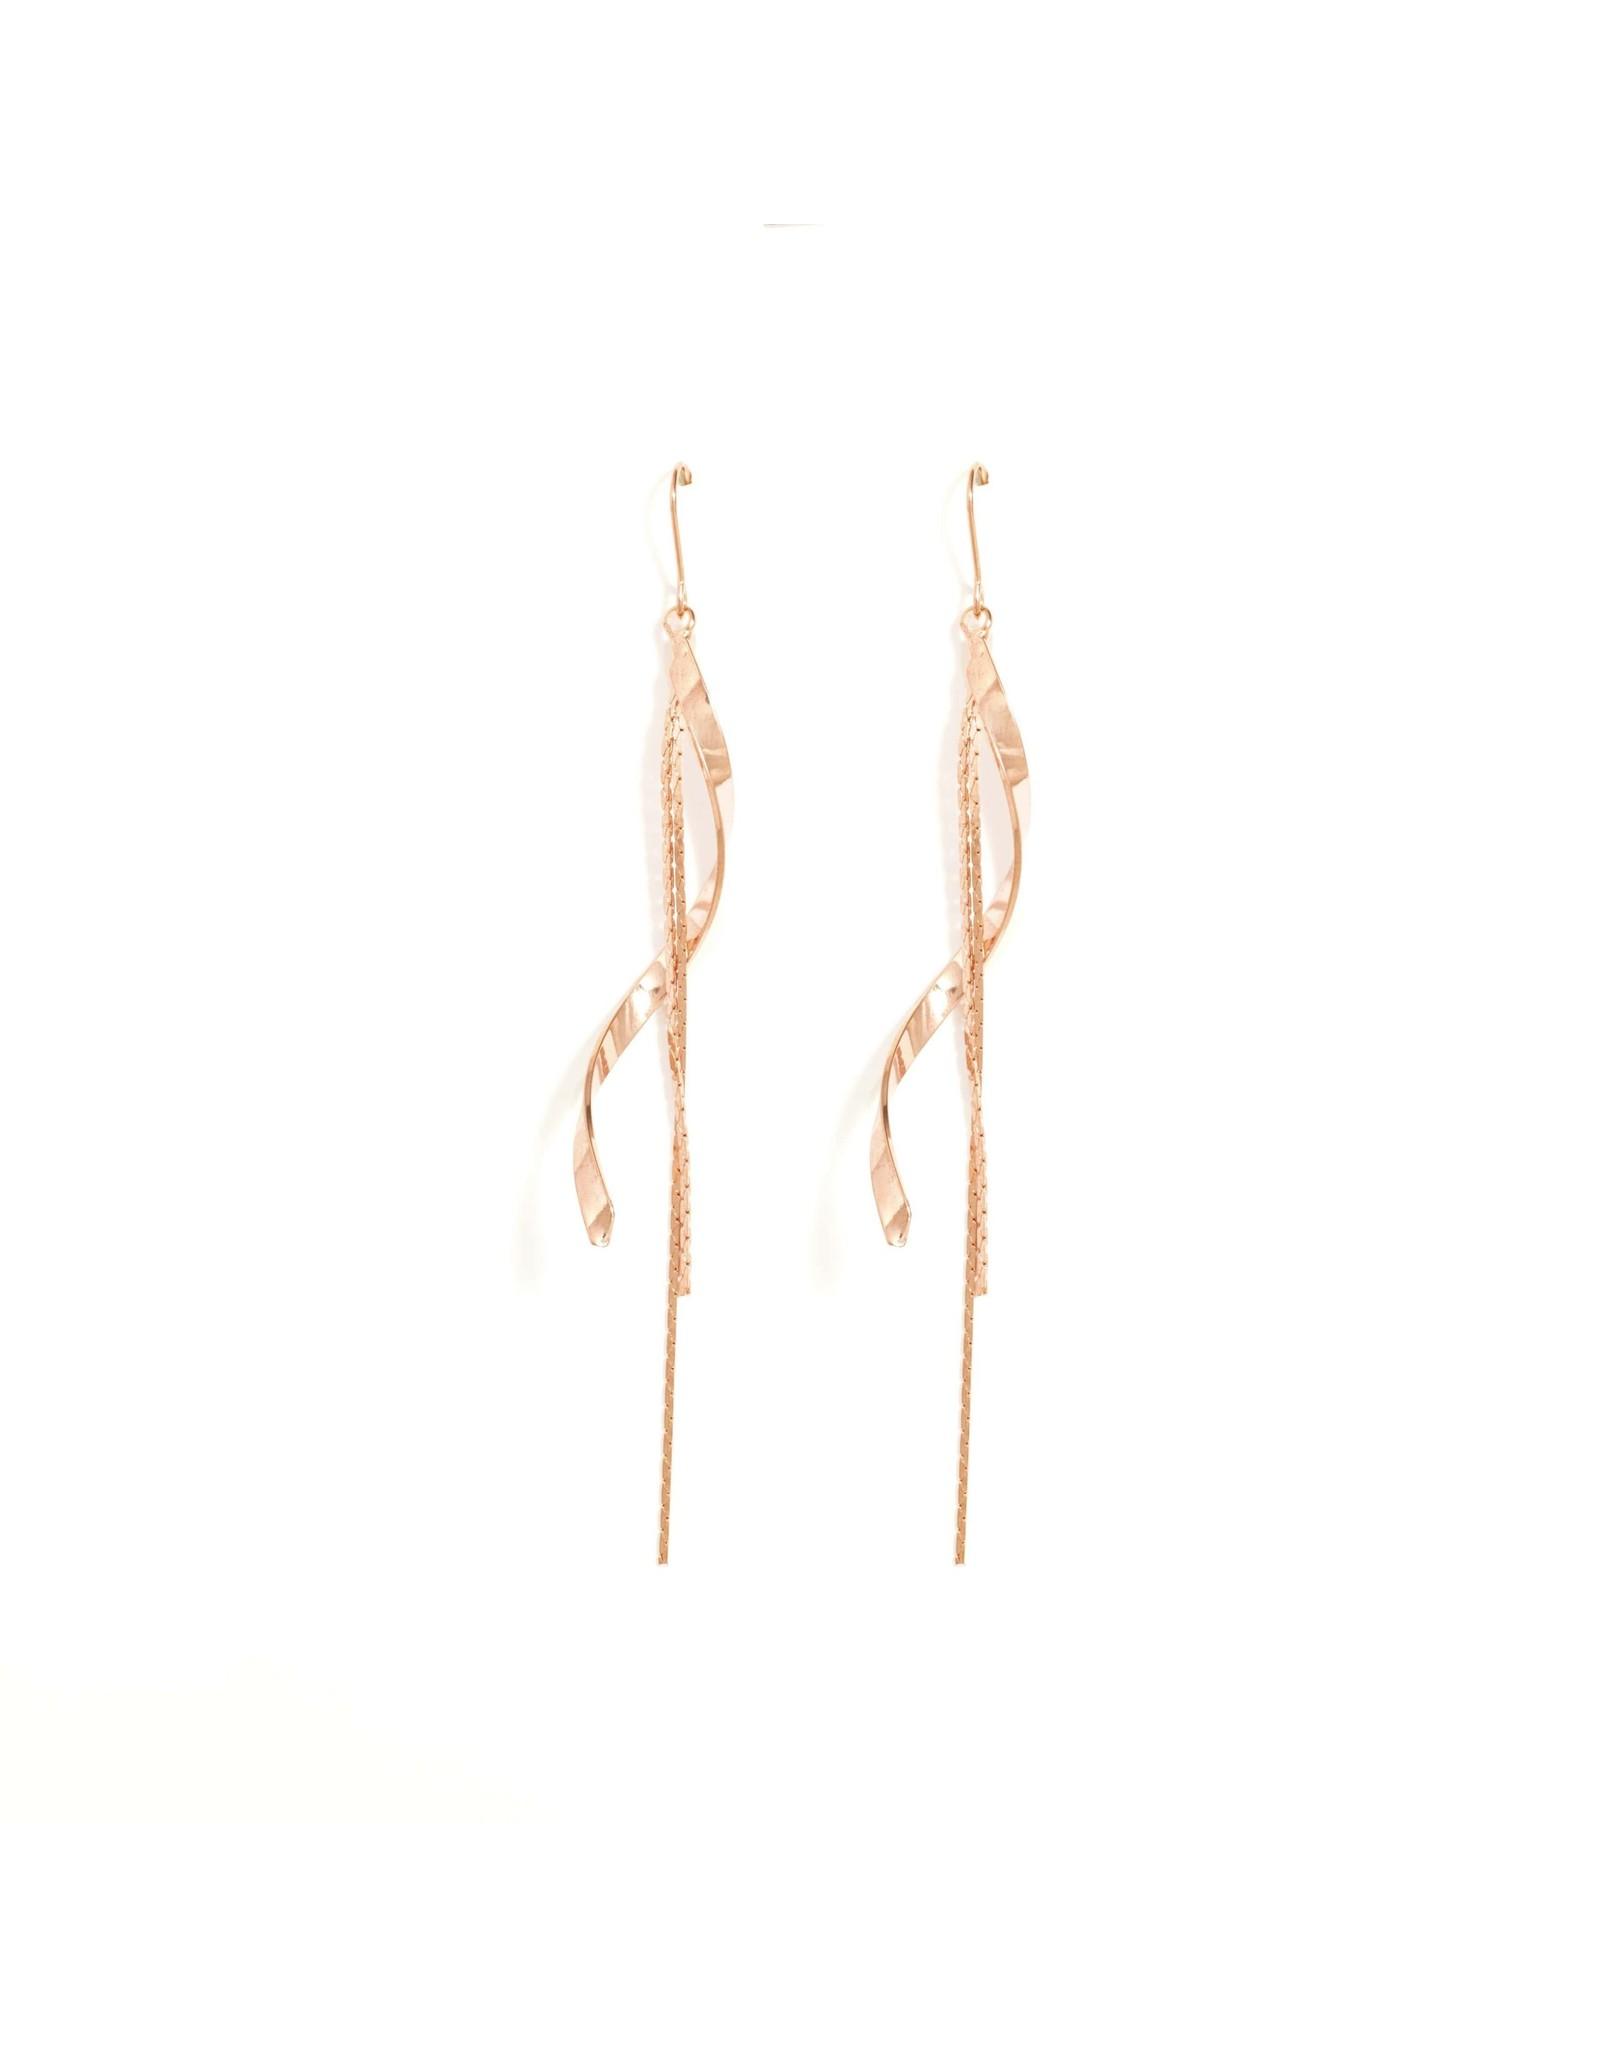 Splendid Iris E/R- Long Swirl Double Chain